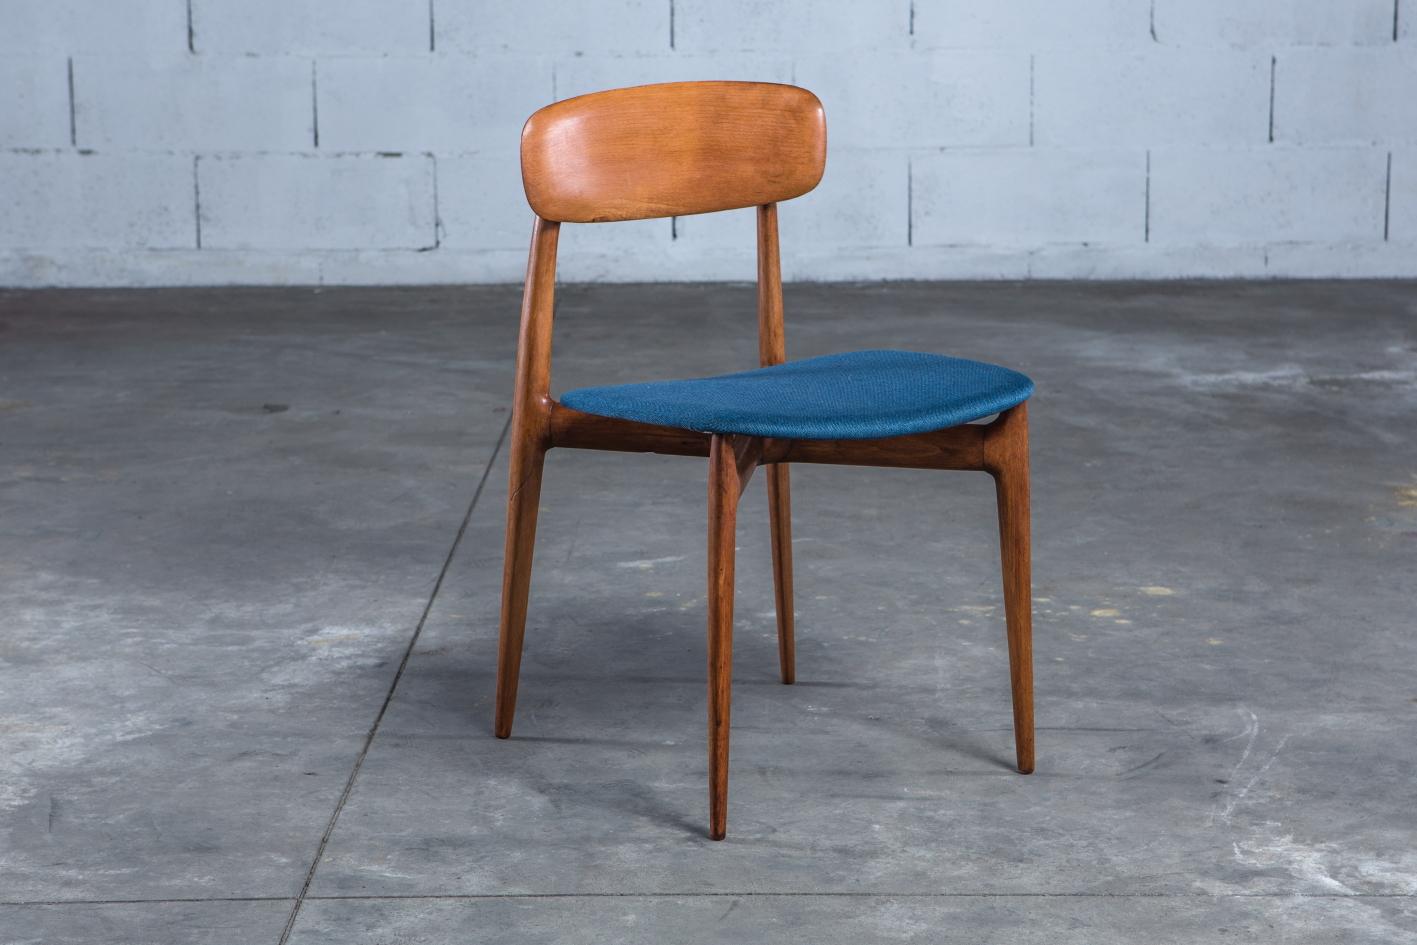 4 Mid century Vintage Italian dining chairs Ico Parisi 1950s - 3/4 view